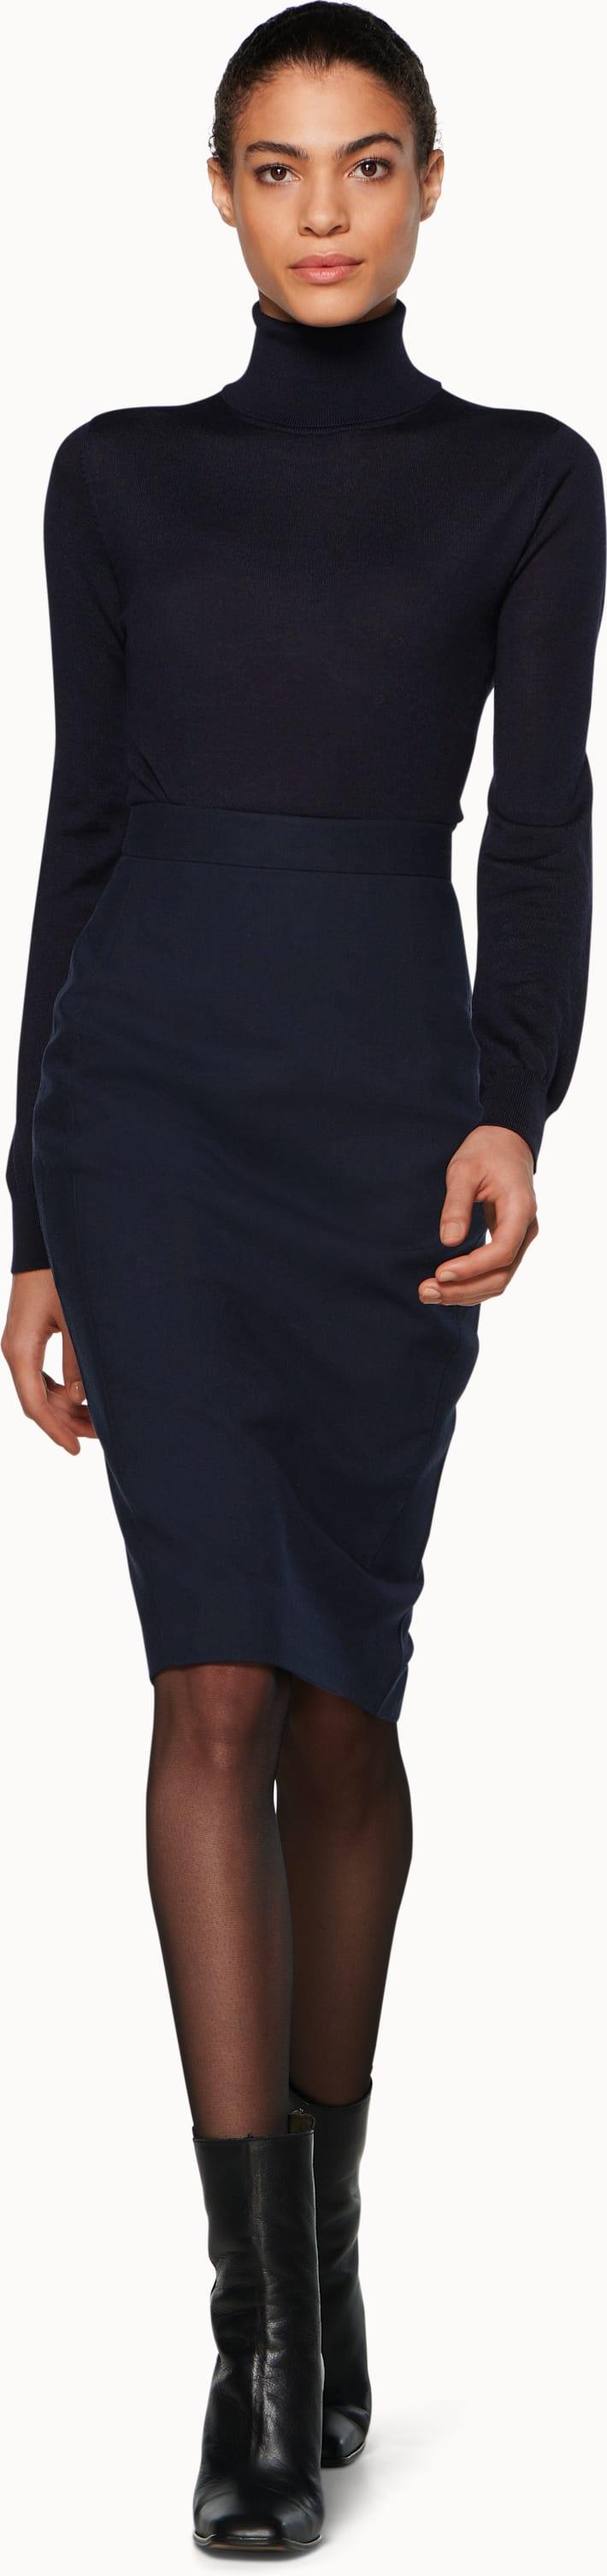 Anais Navy Skirt